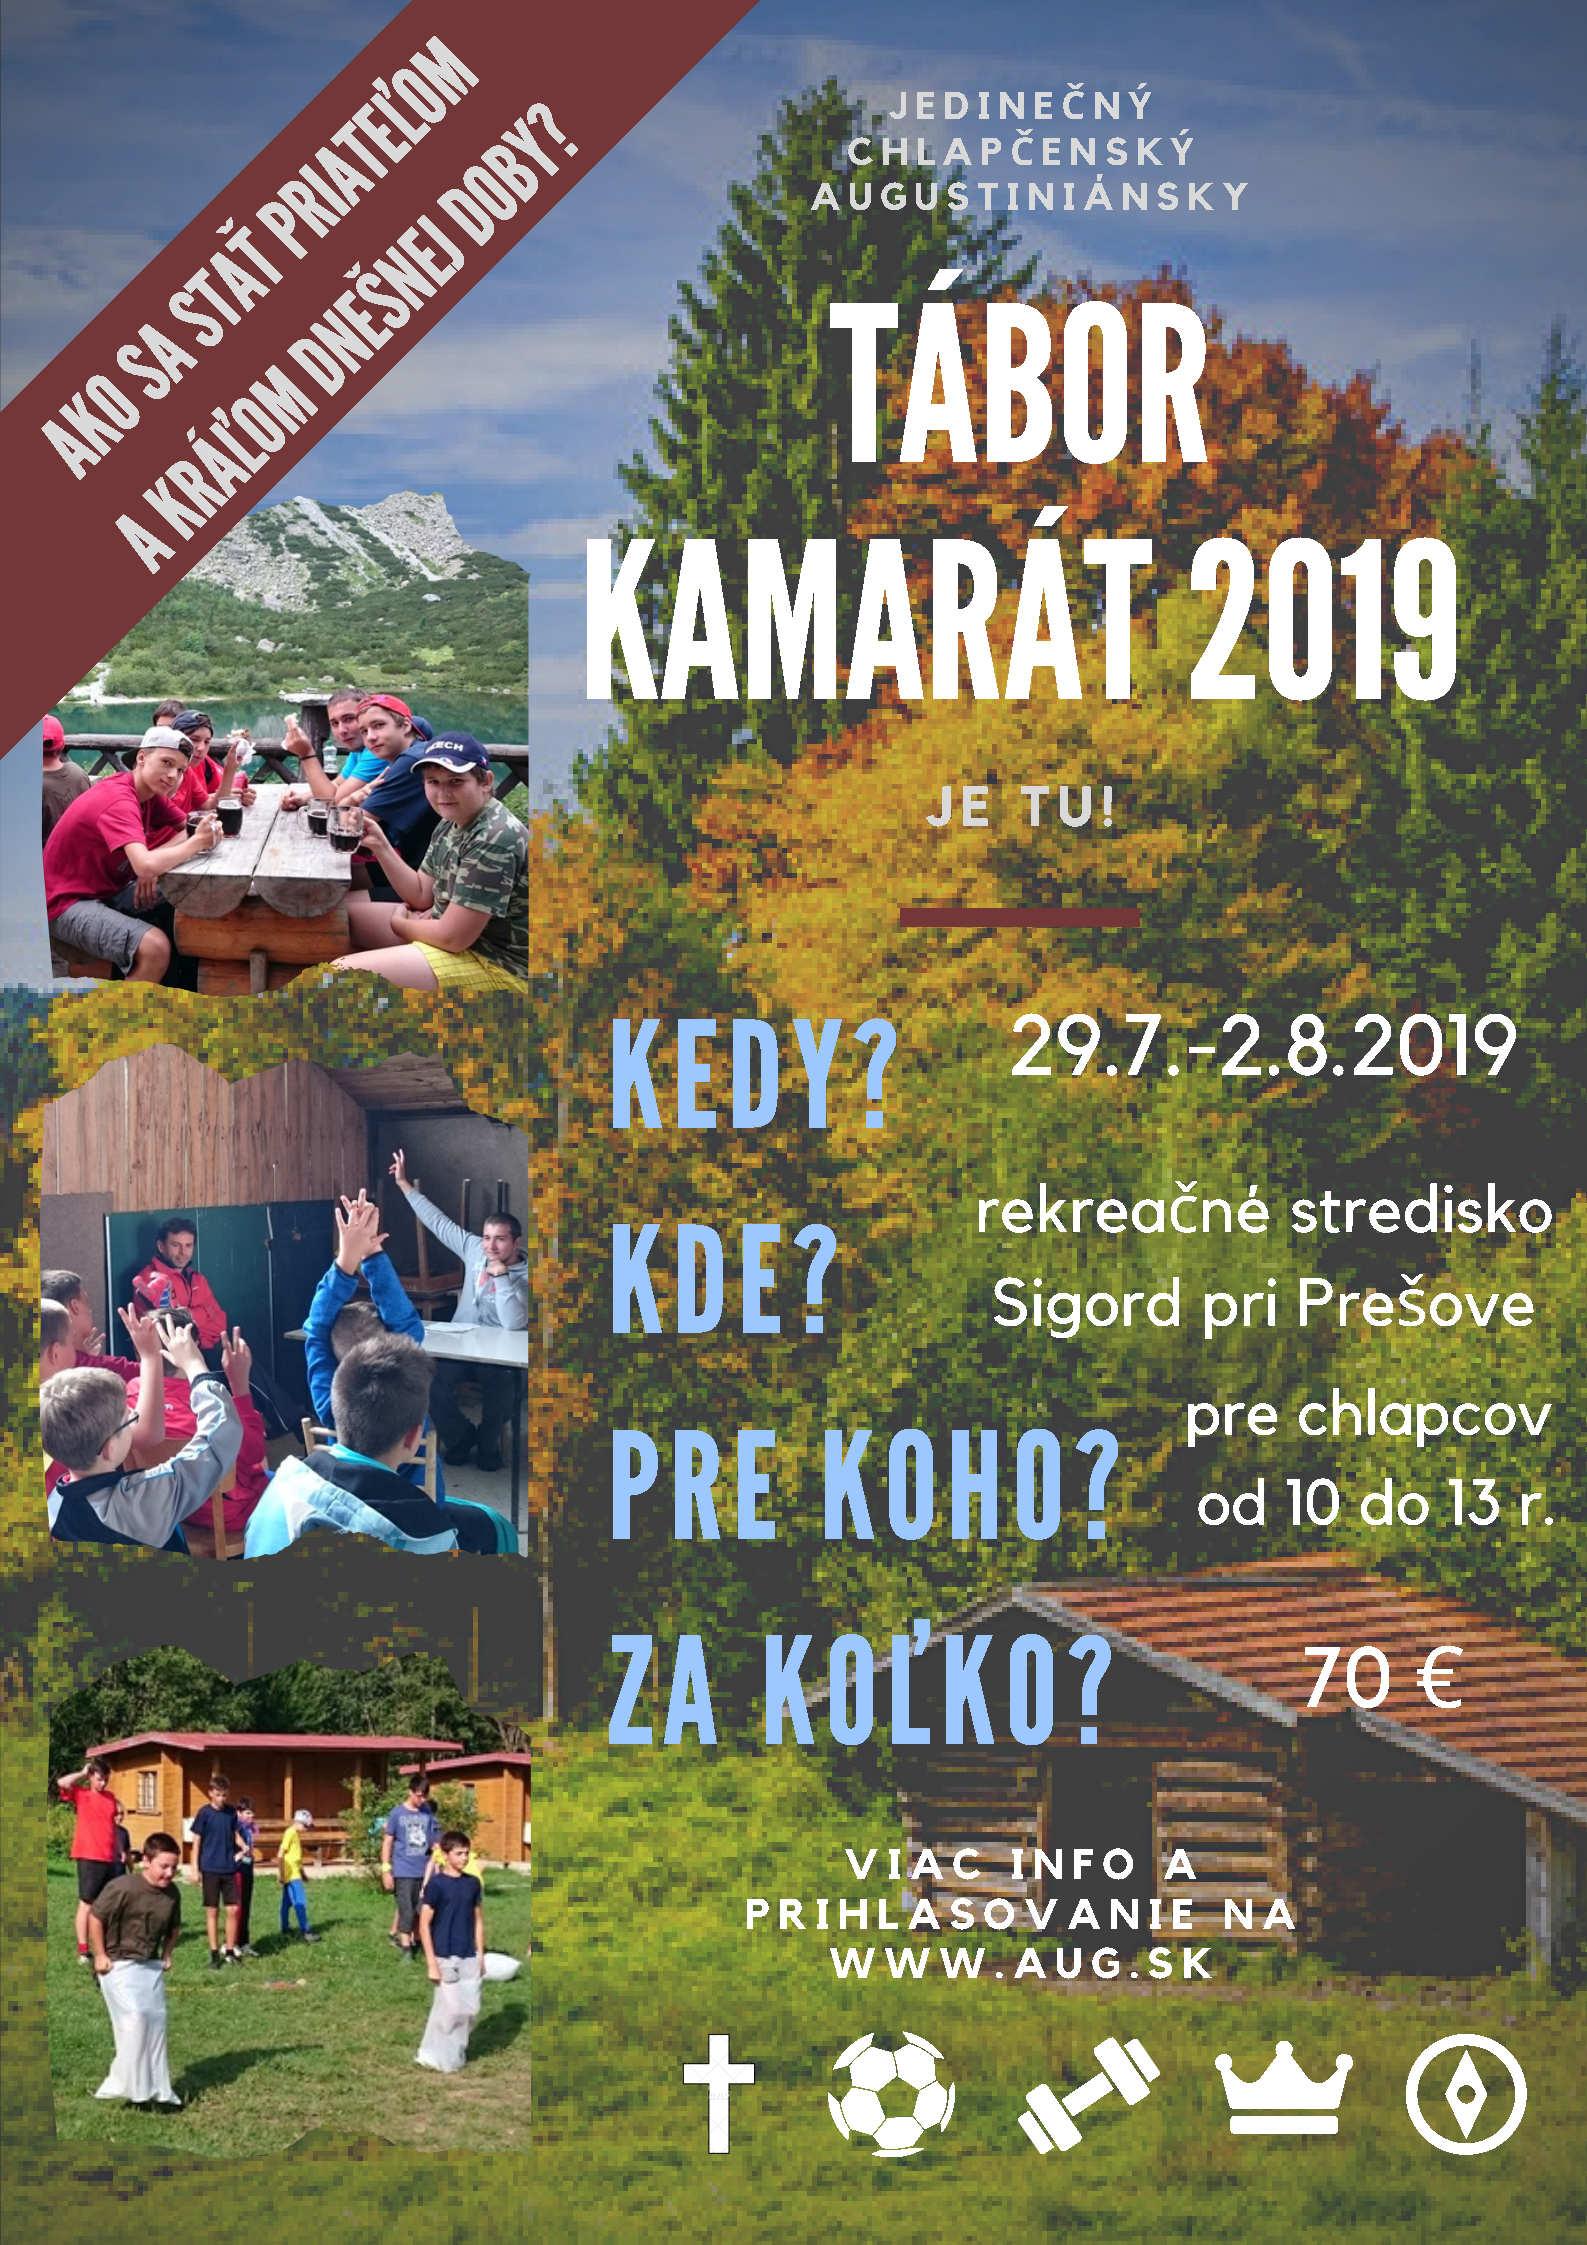 Tábor Kamarát 2019